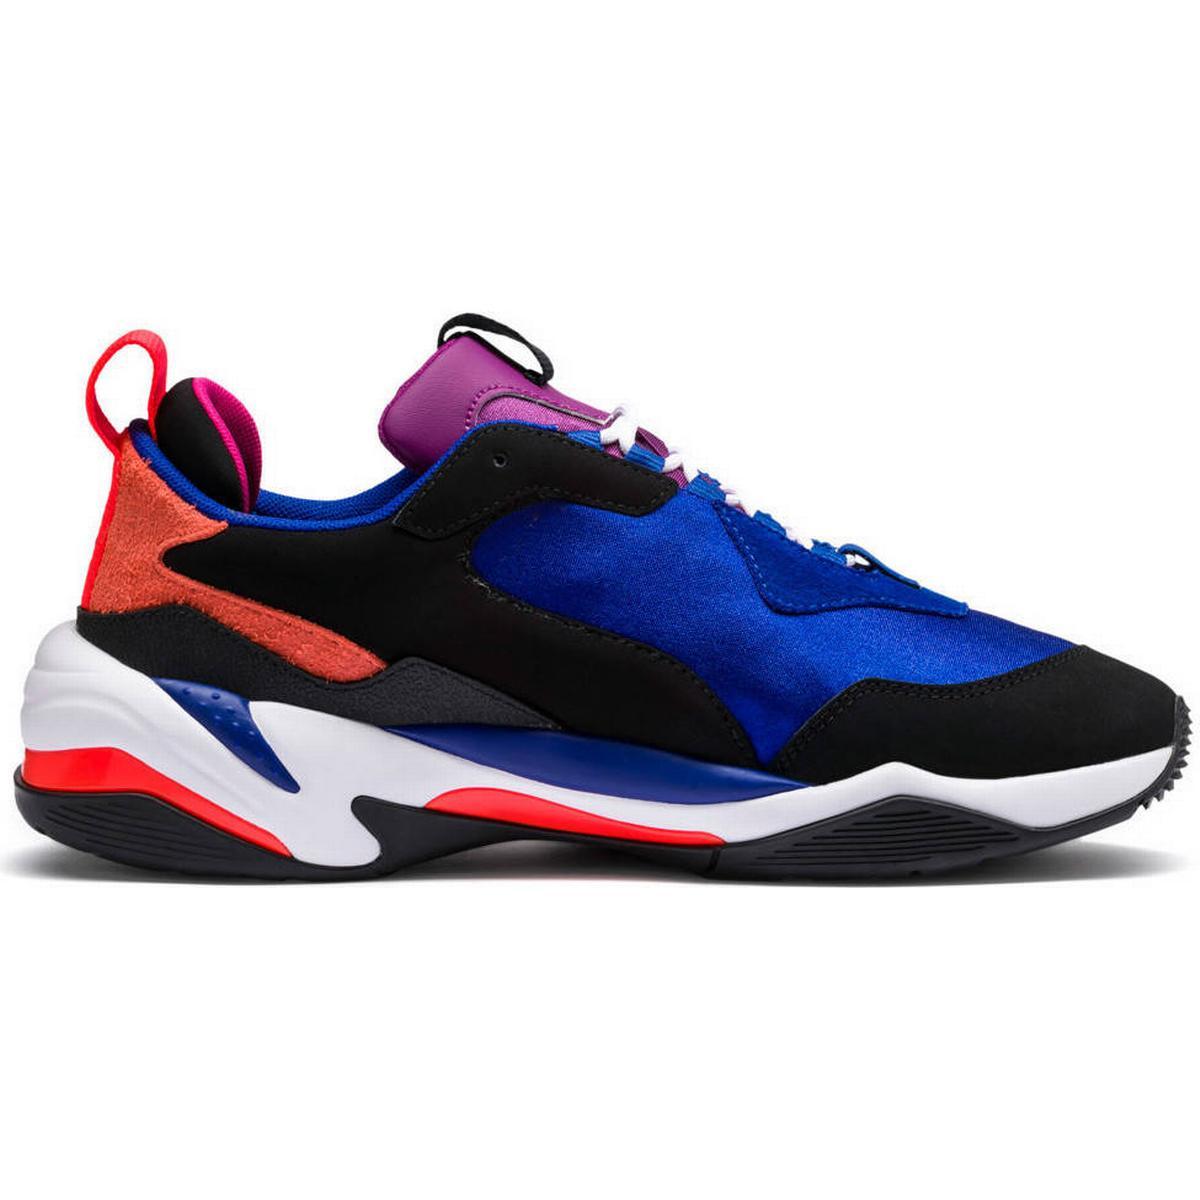 Billige Puma Fenty Trainer Hi Damesko Sort | Puma Sneakers